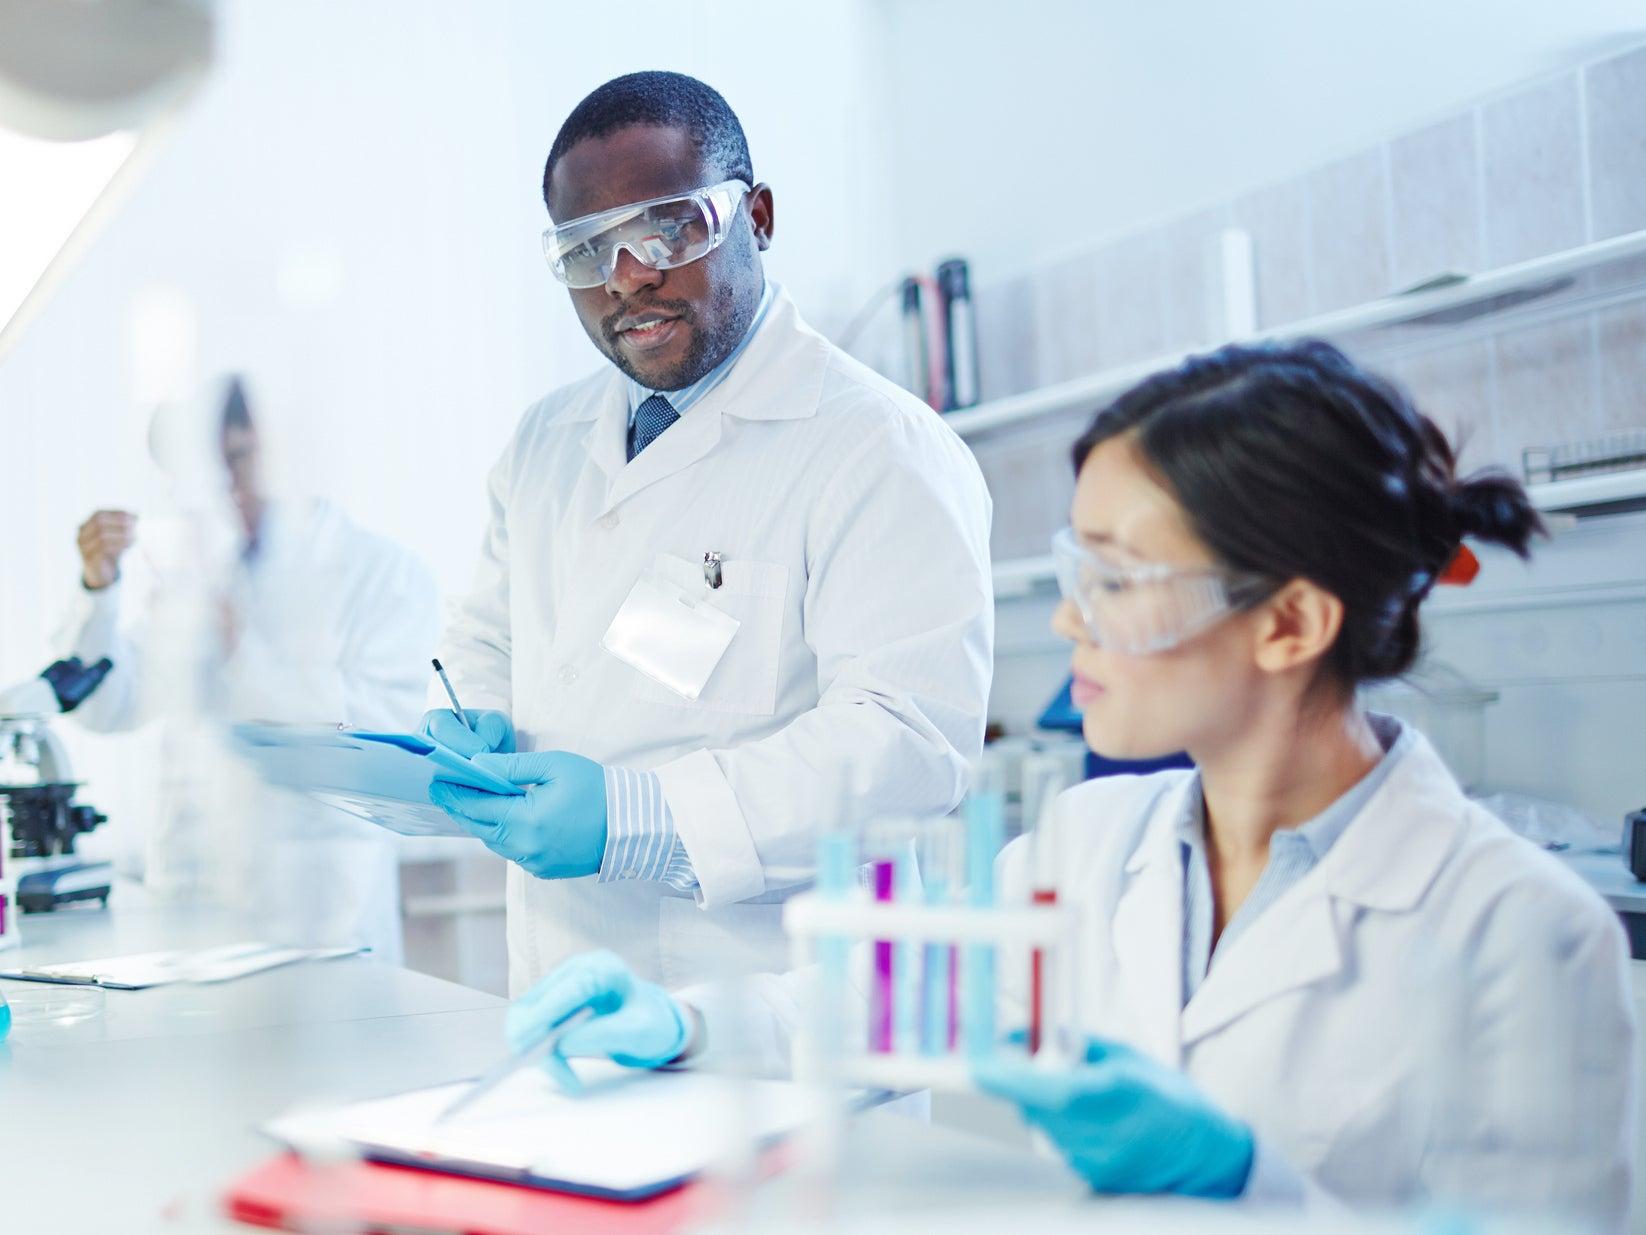 scientist scientists independent male science female boffins work visa billy track fast describe unique gender